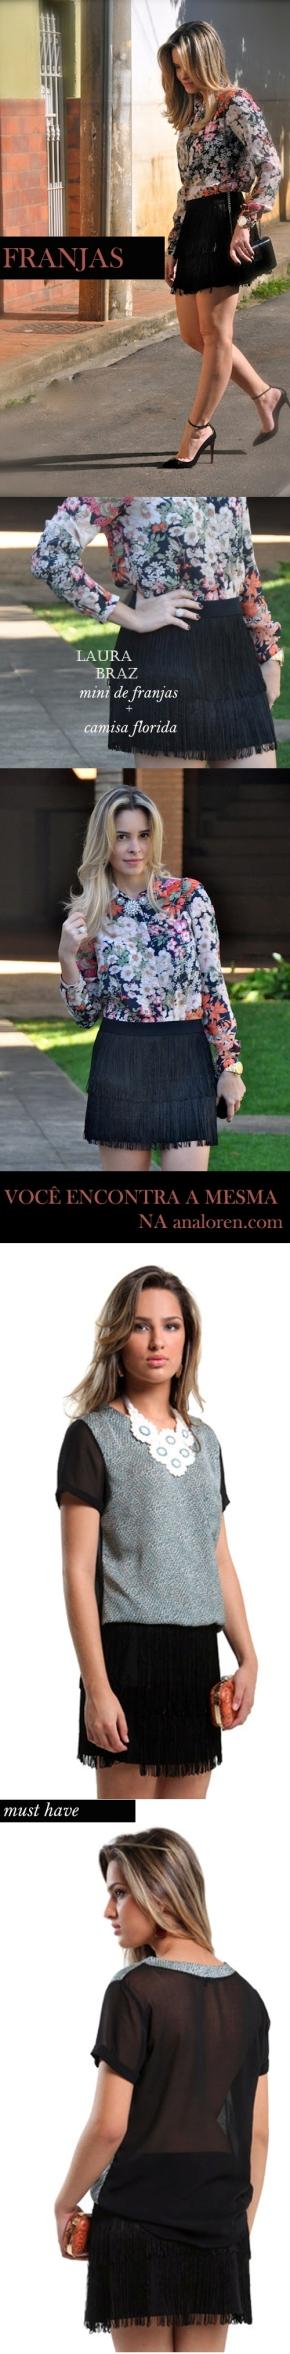 FRANJAS LAURA BRAZ ANALOREN